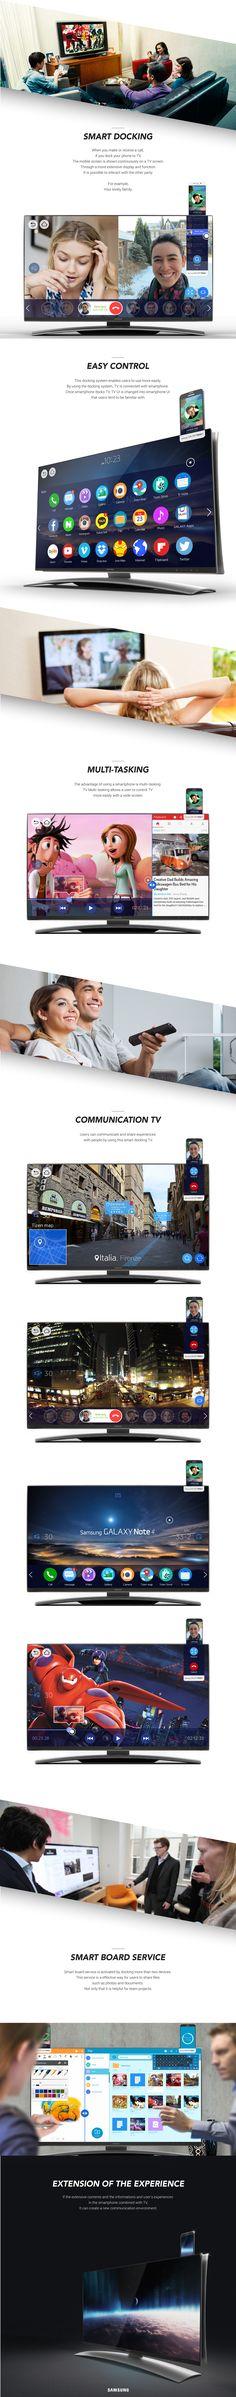 Smart Docking TV on Behance                                                                                                                                                     More